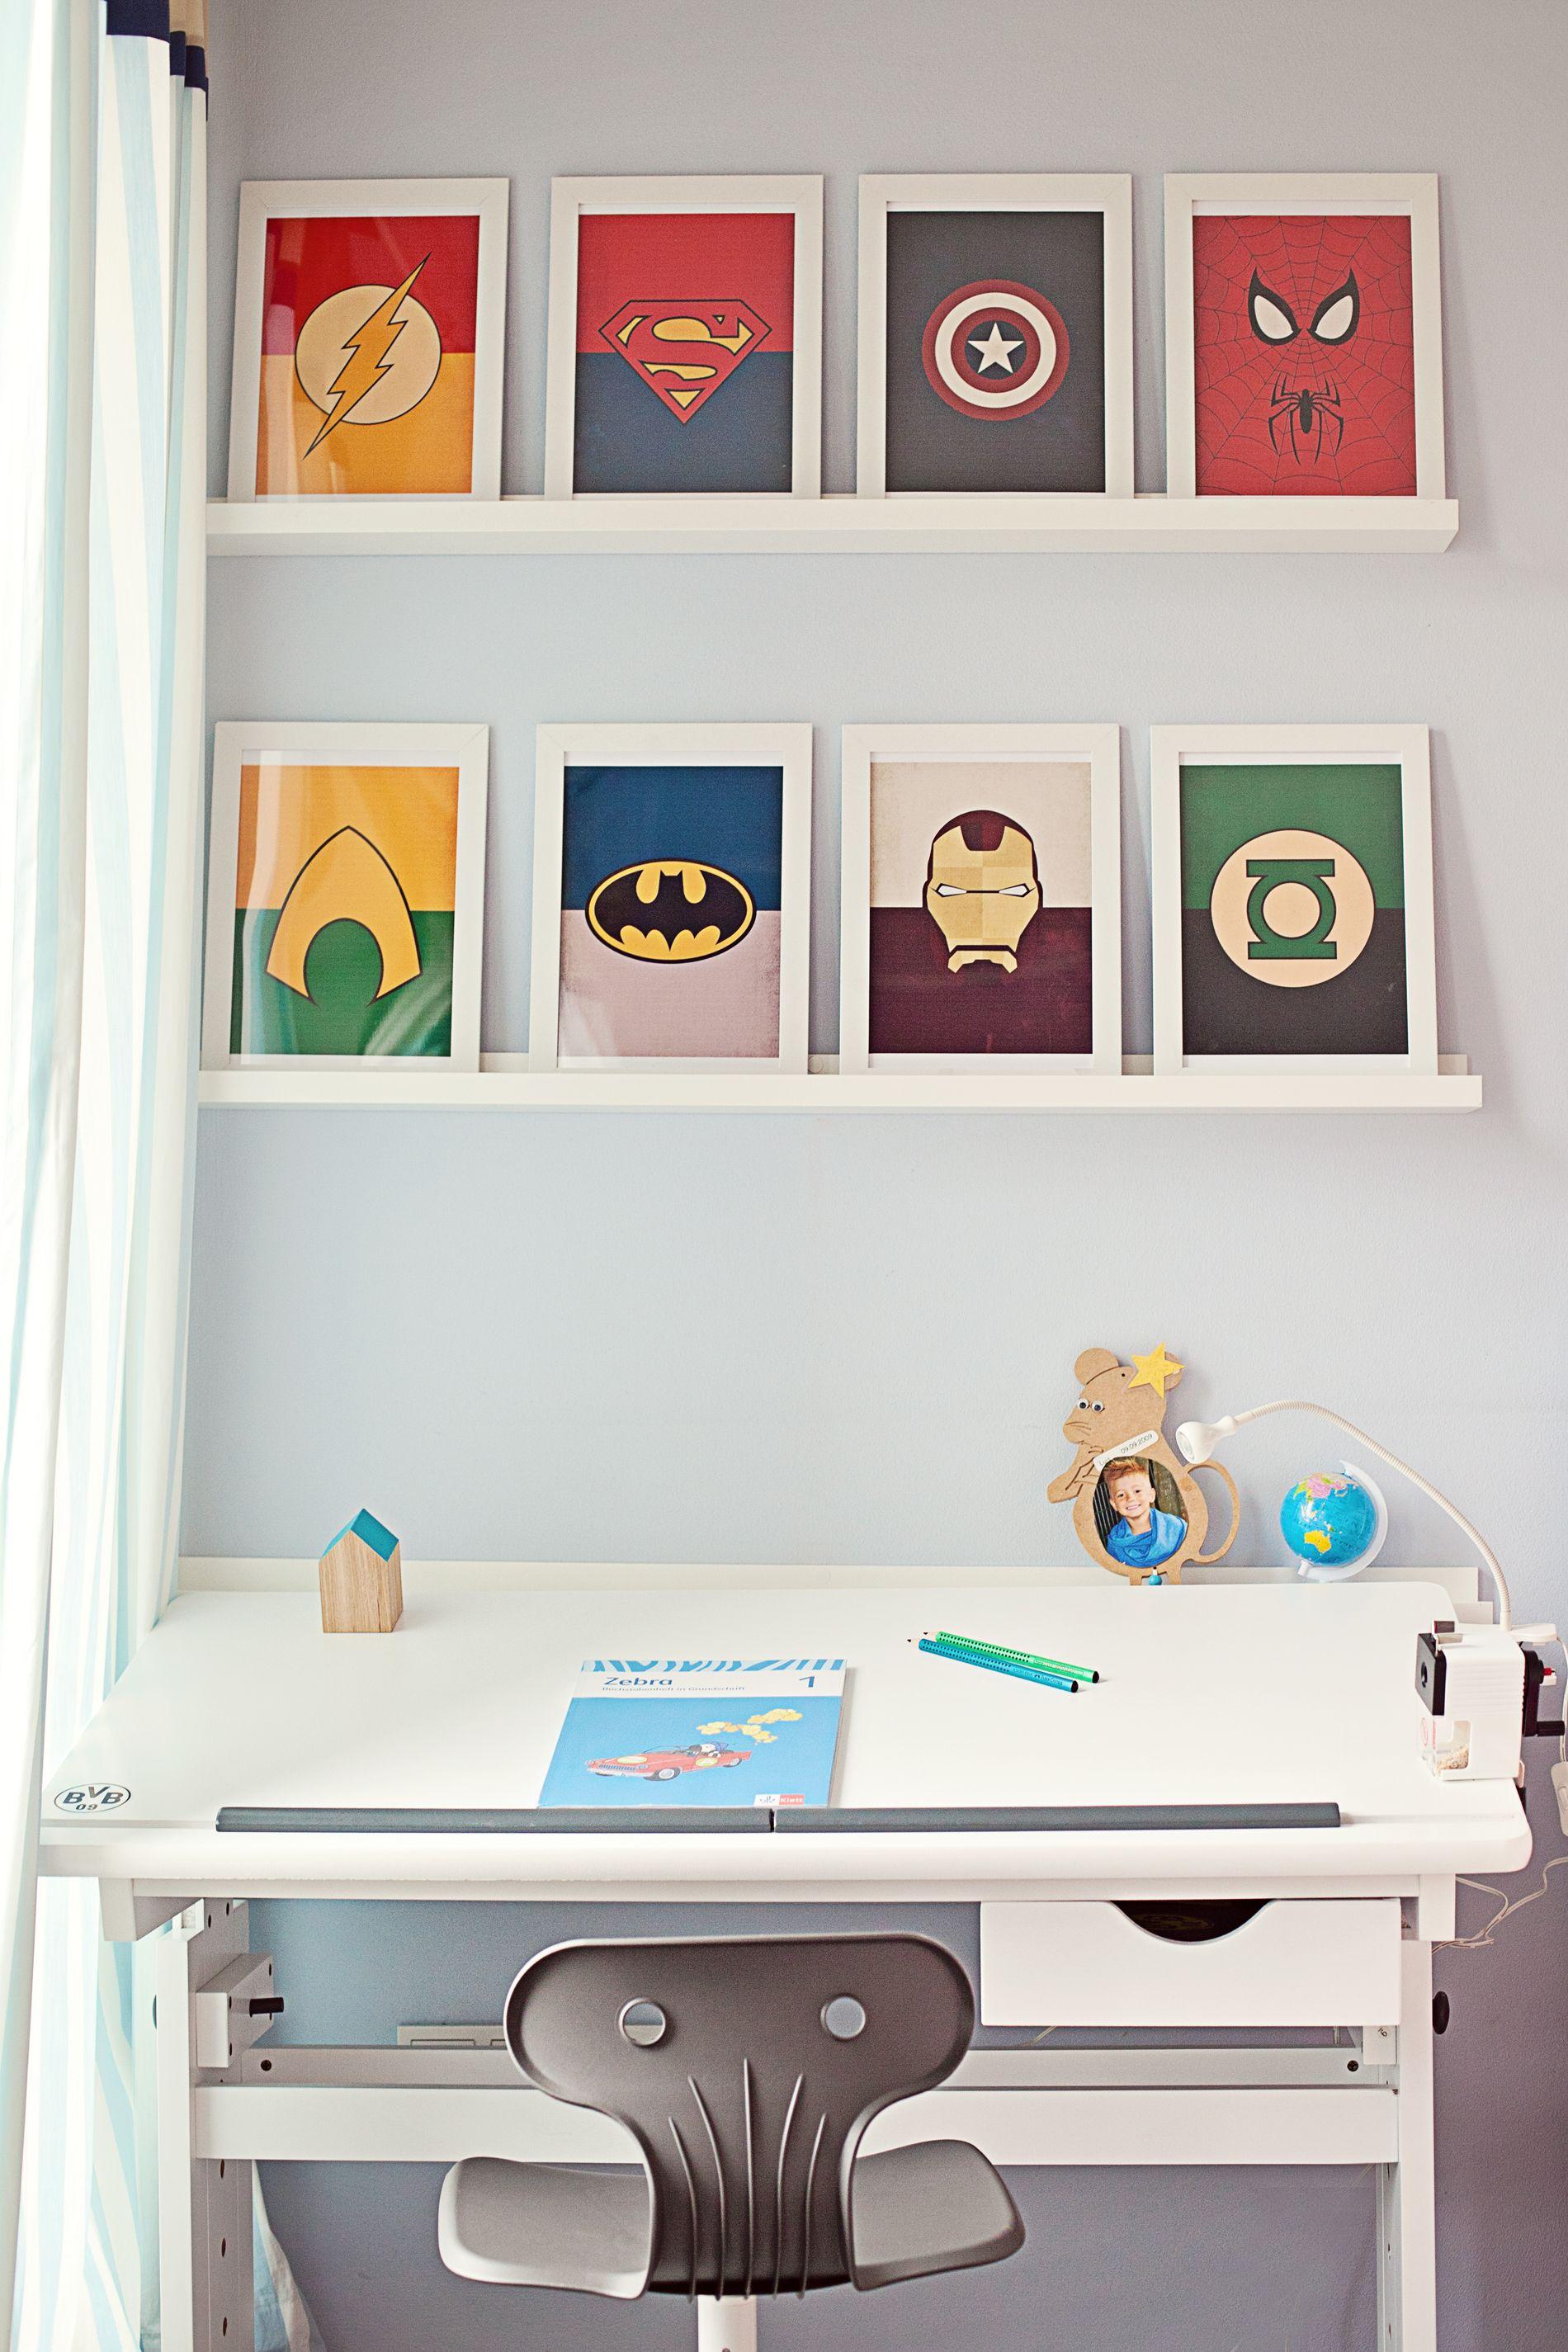 superhelden arbeitsplatz kids pinterest kinderzimmer junge kinderzimmer und kinderzimmer. Black Bedroom Furniture Sets. Home Design Ideas